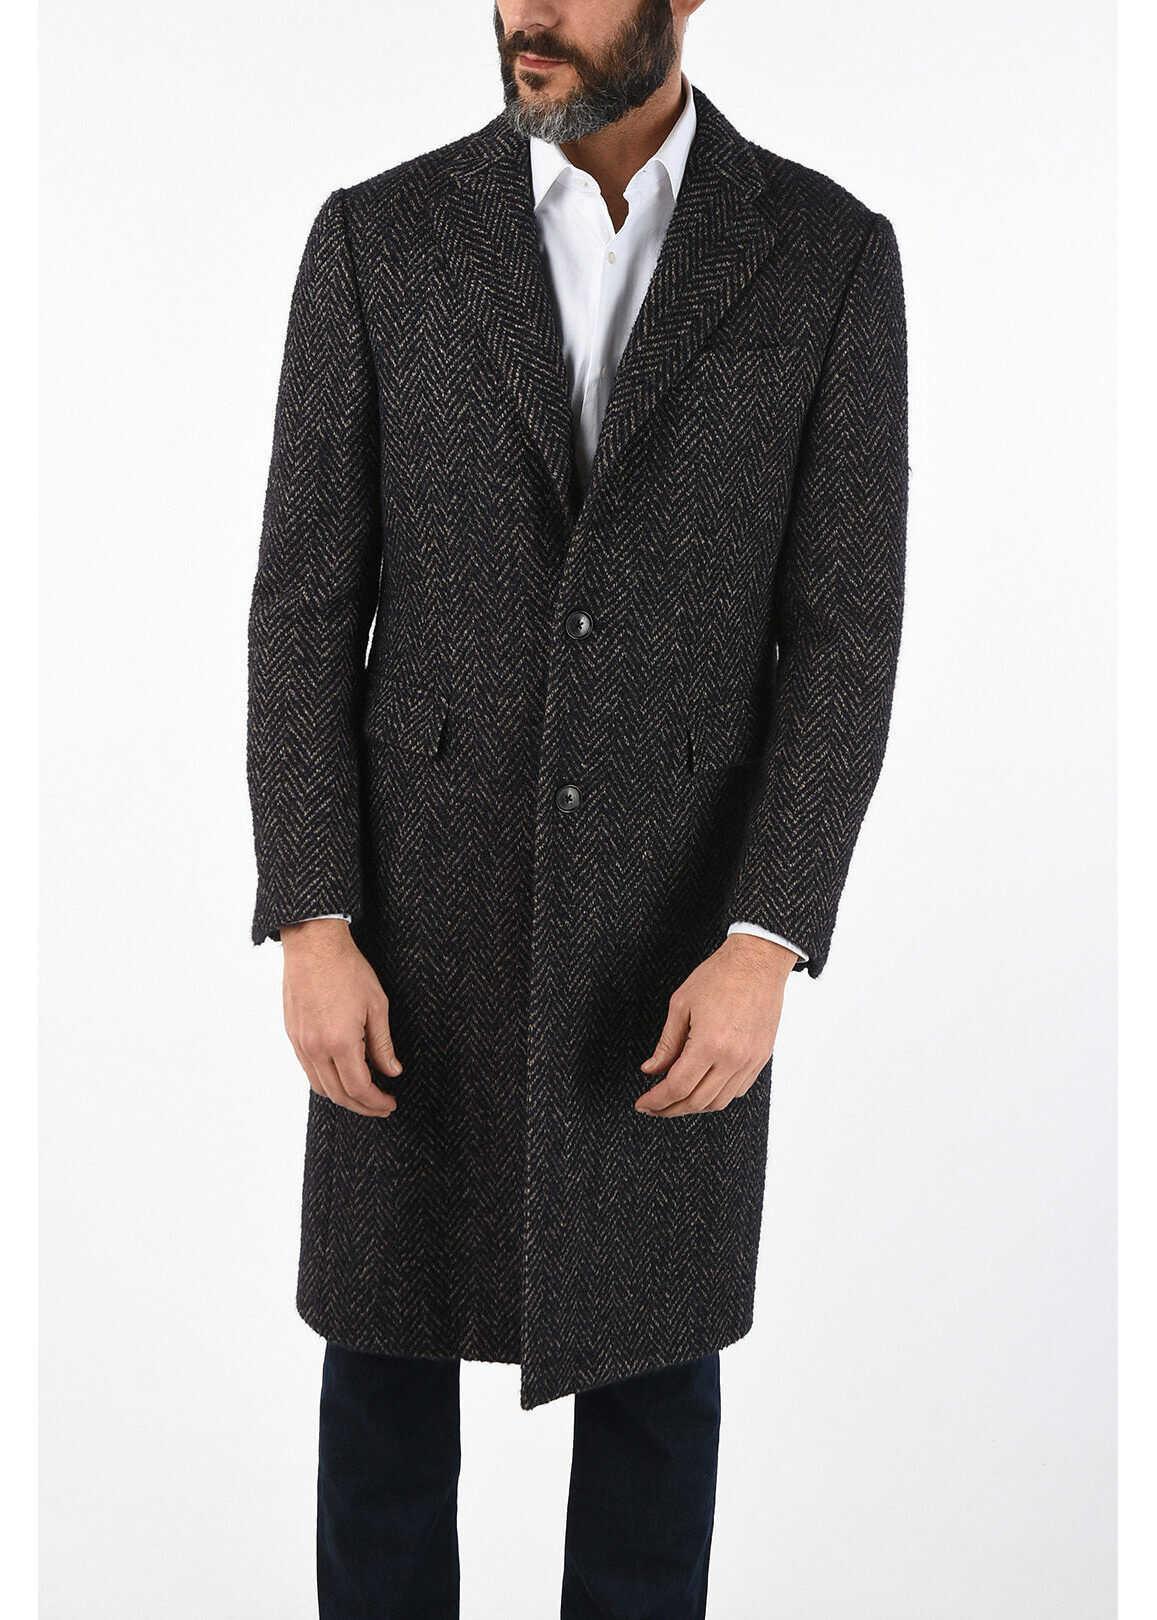 CORNELIANI plain herringbone cashmere and virgin wool coat MULTICOLOR imagine